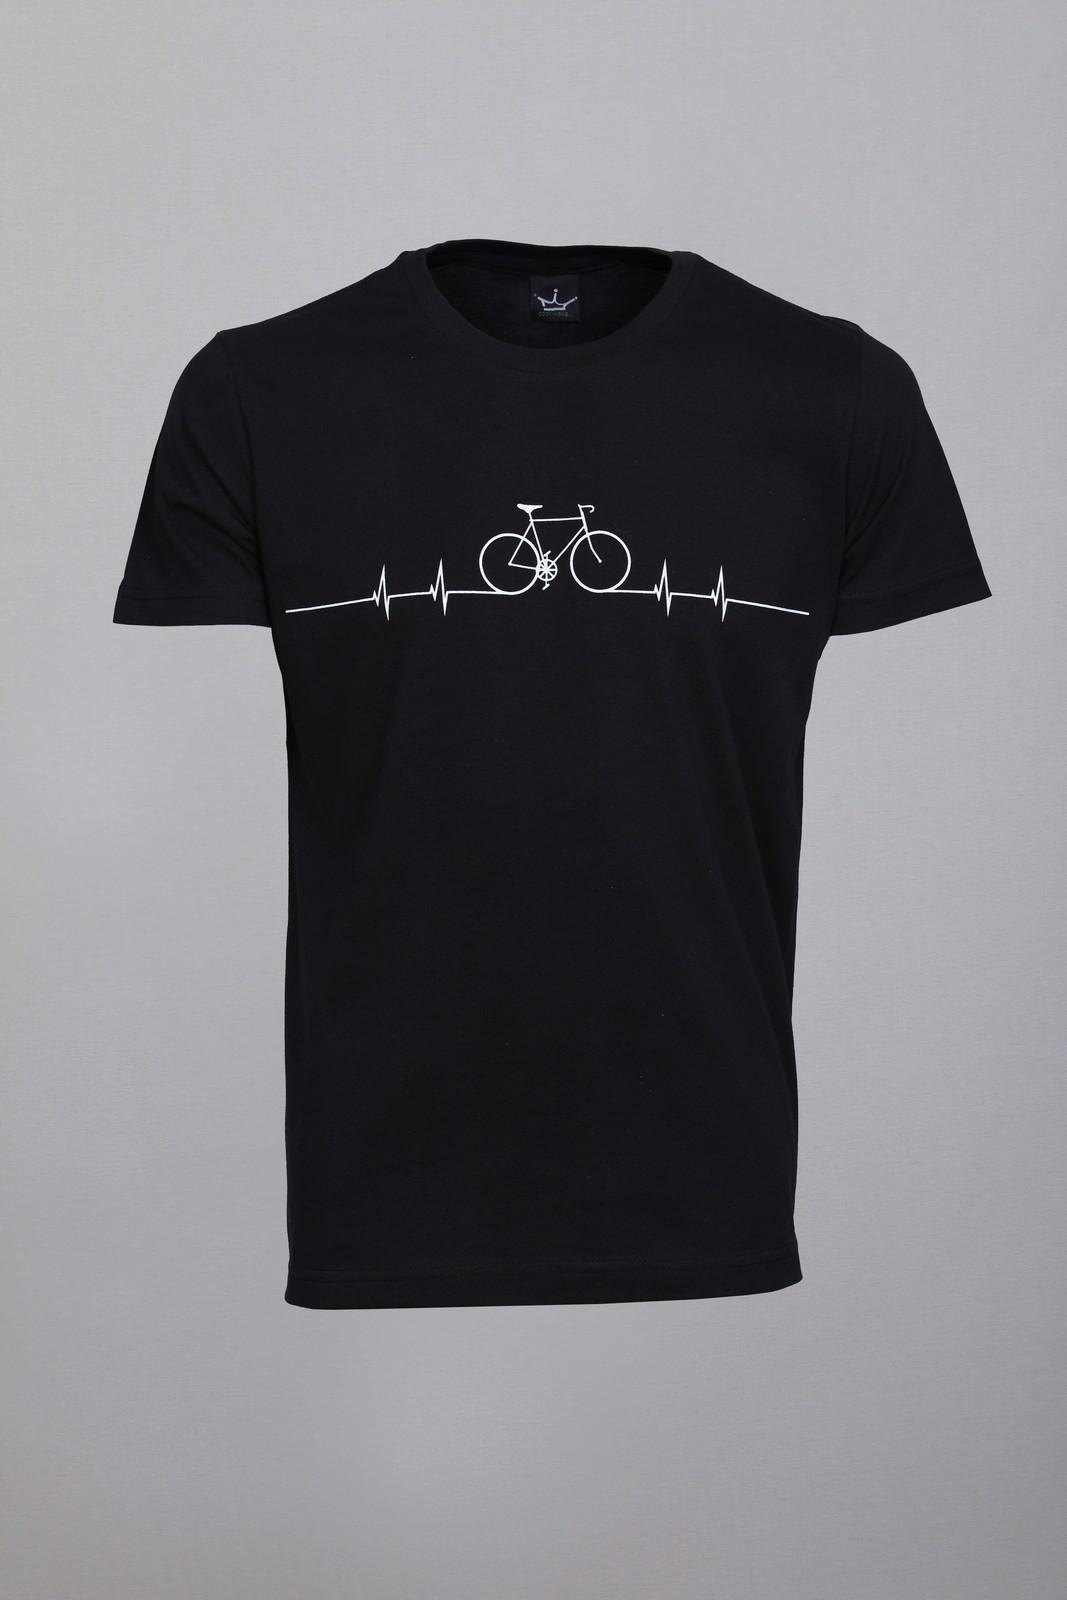 Camiseta CoolWave Bicycle Lines Preta